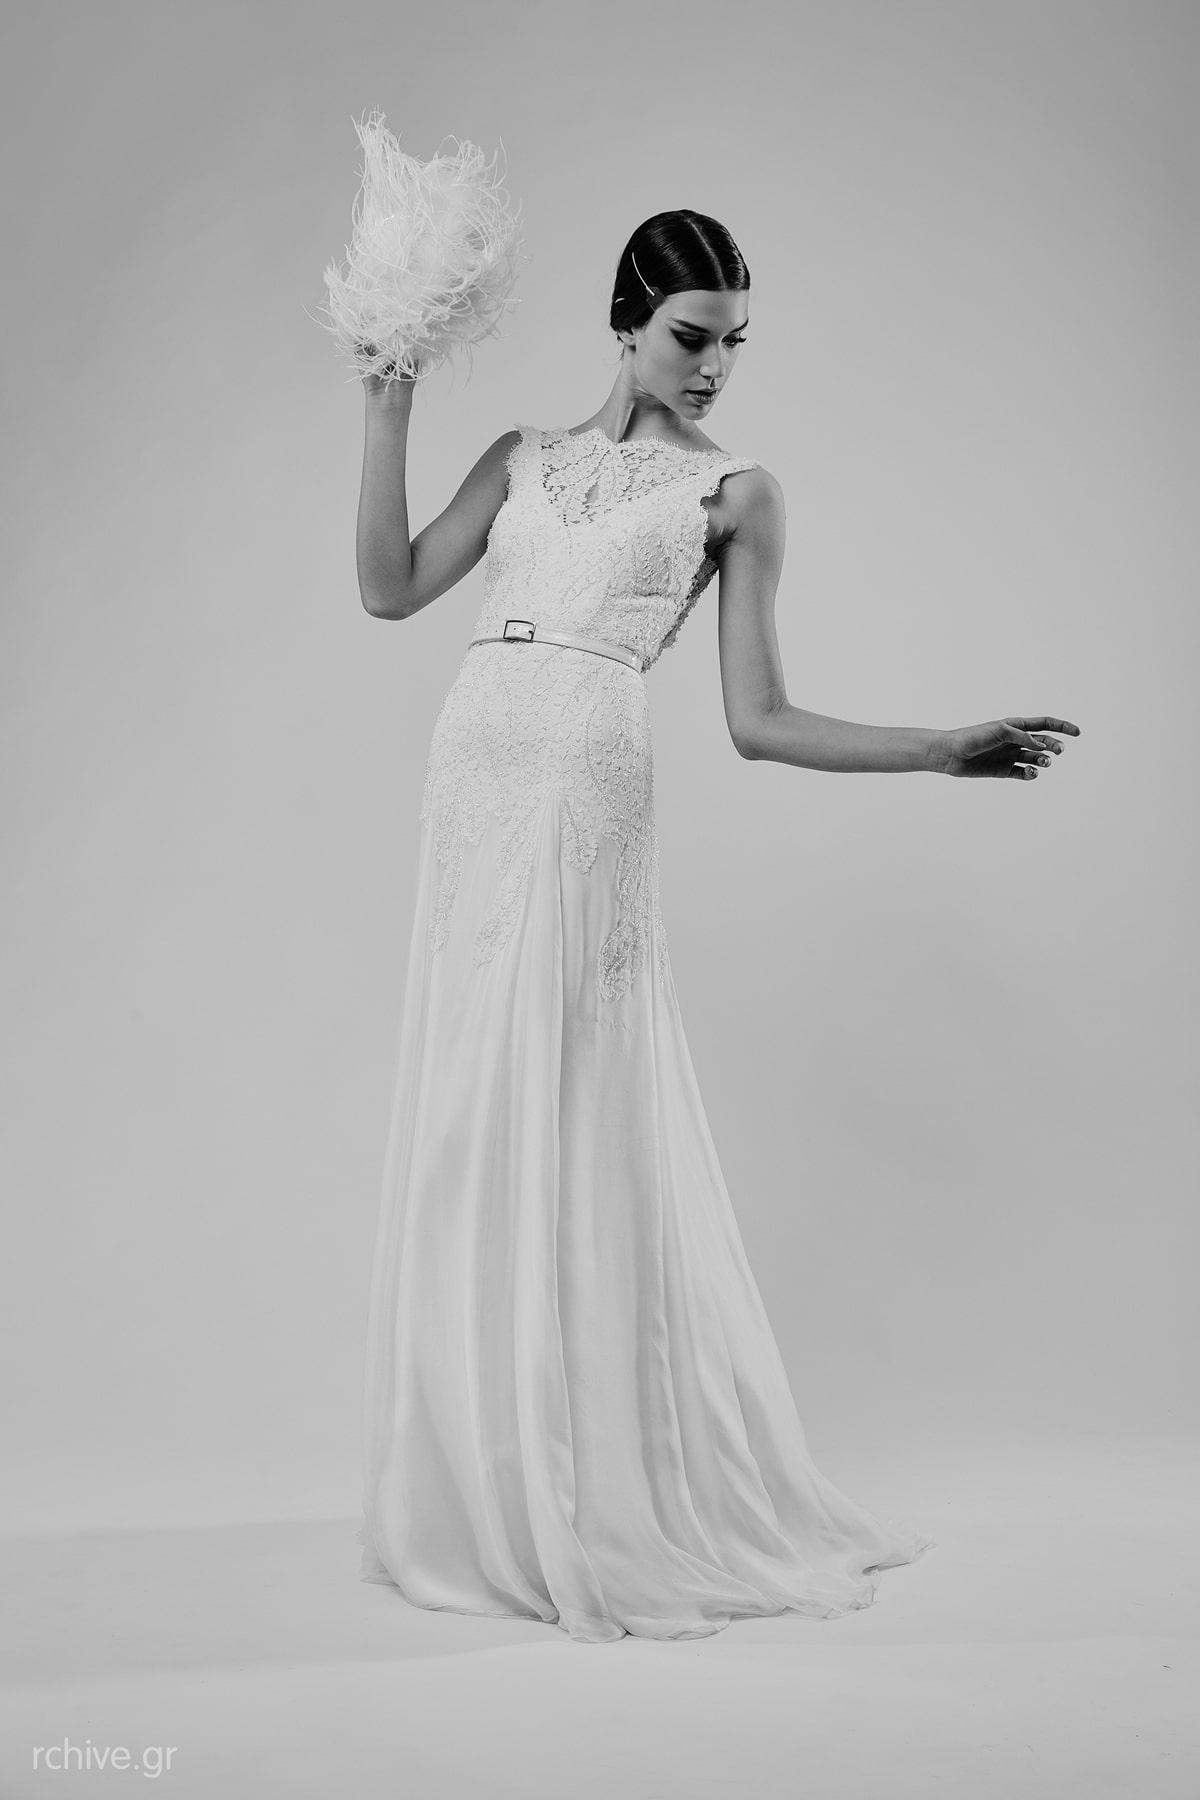 Sleek wedding dress with closed neckline and thin white belt Mairi ...